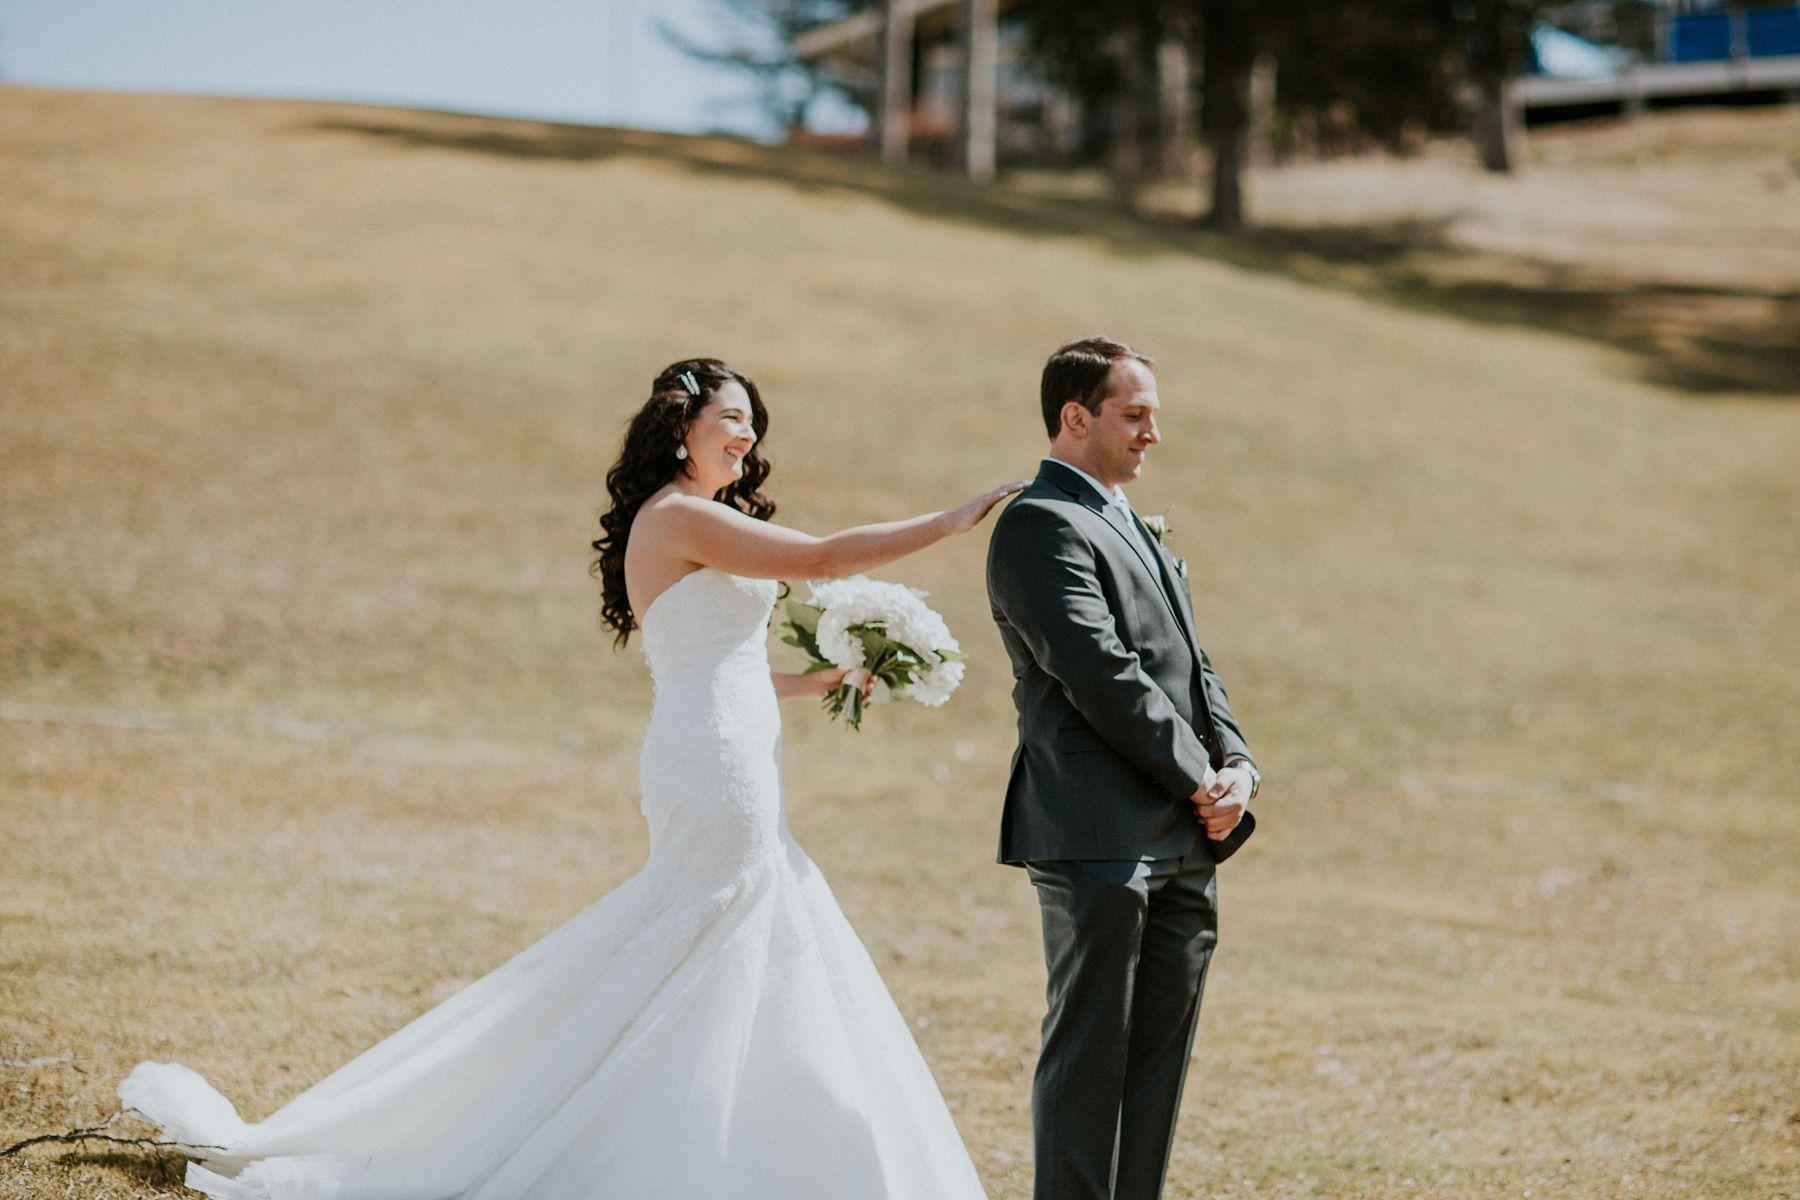 The Garrison Wedding Photos Nj wedding photographer